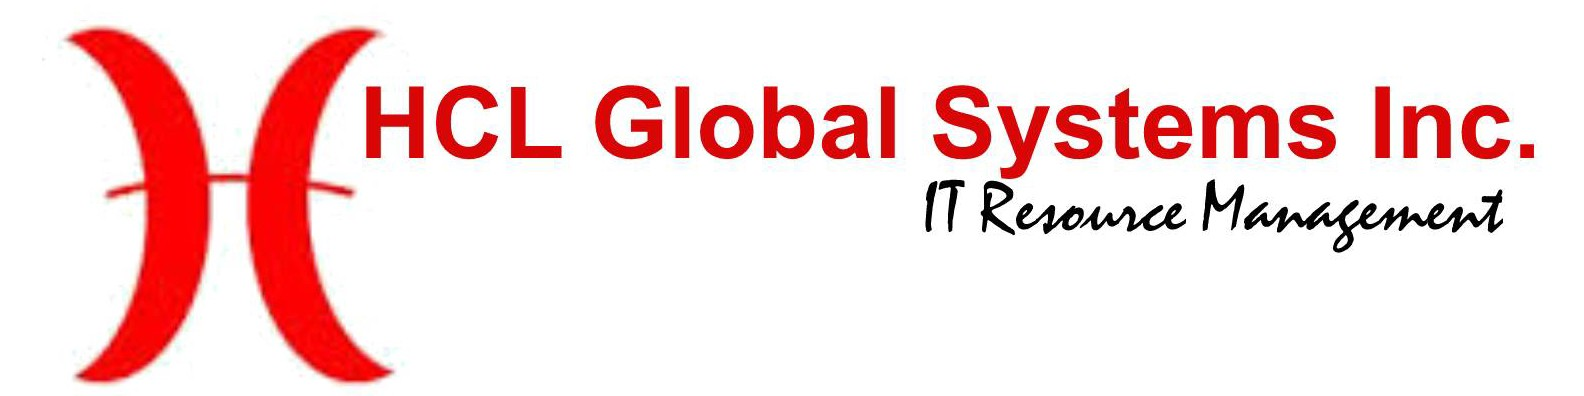 HCL Global Systems Inc | LinkedIn